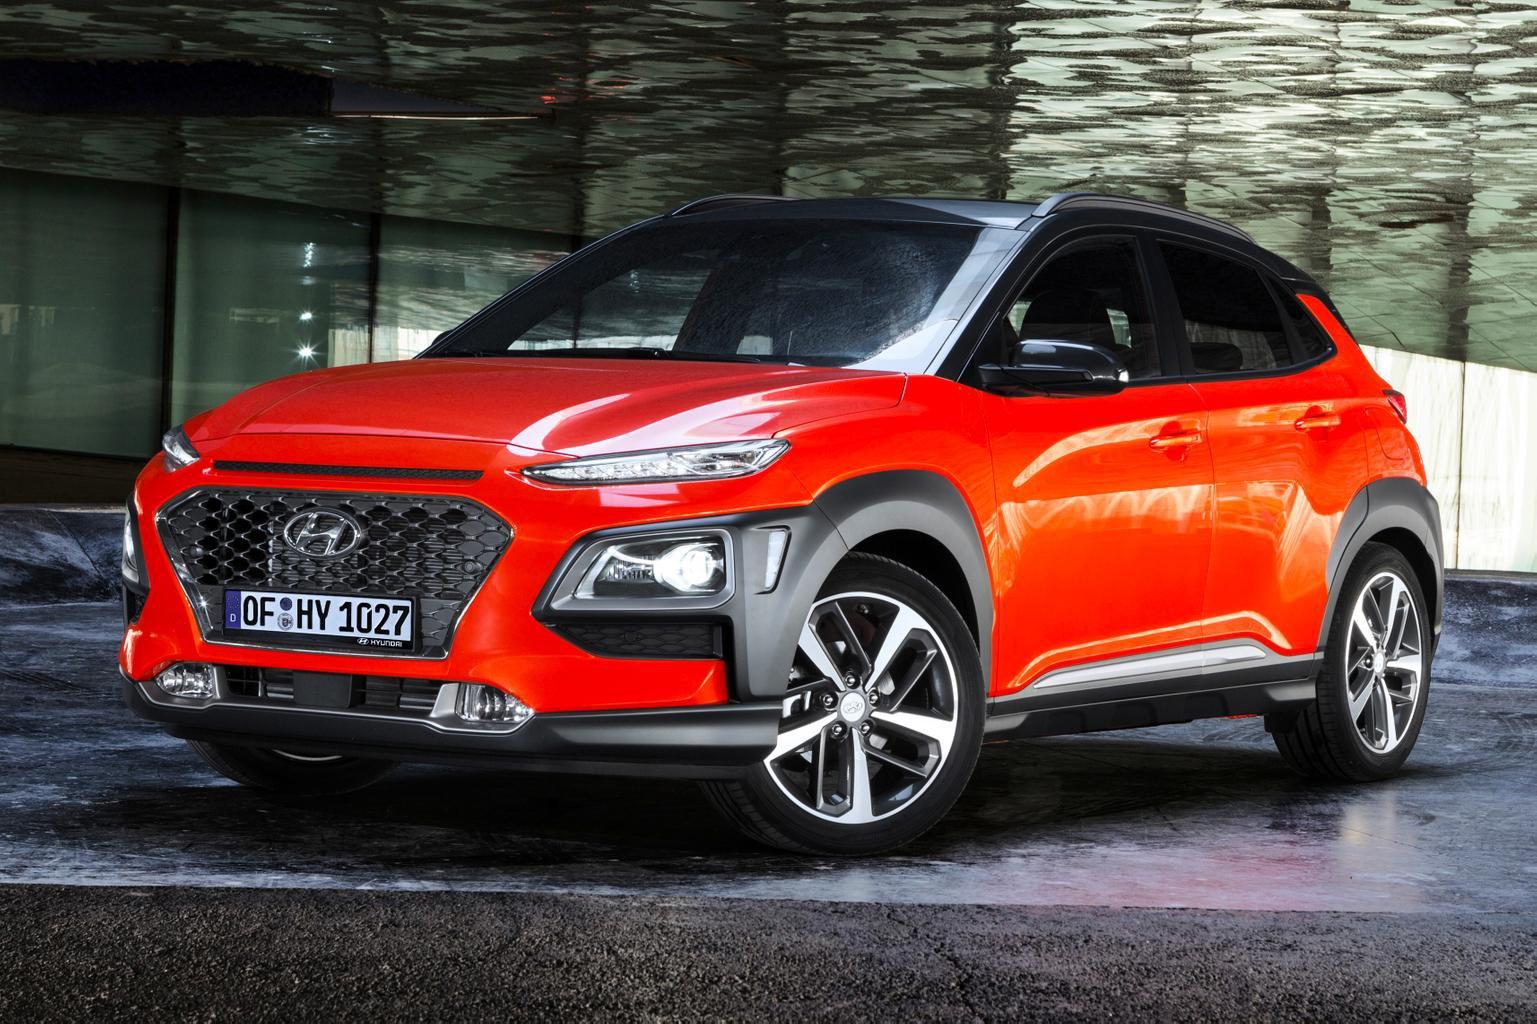 2018 Hyundai Kona 1.6 CRDi 115 verdict